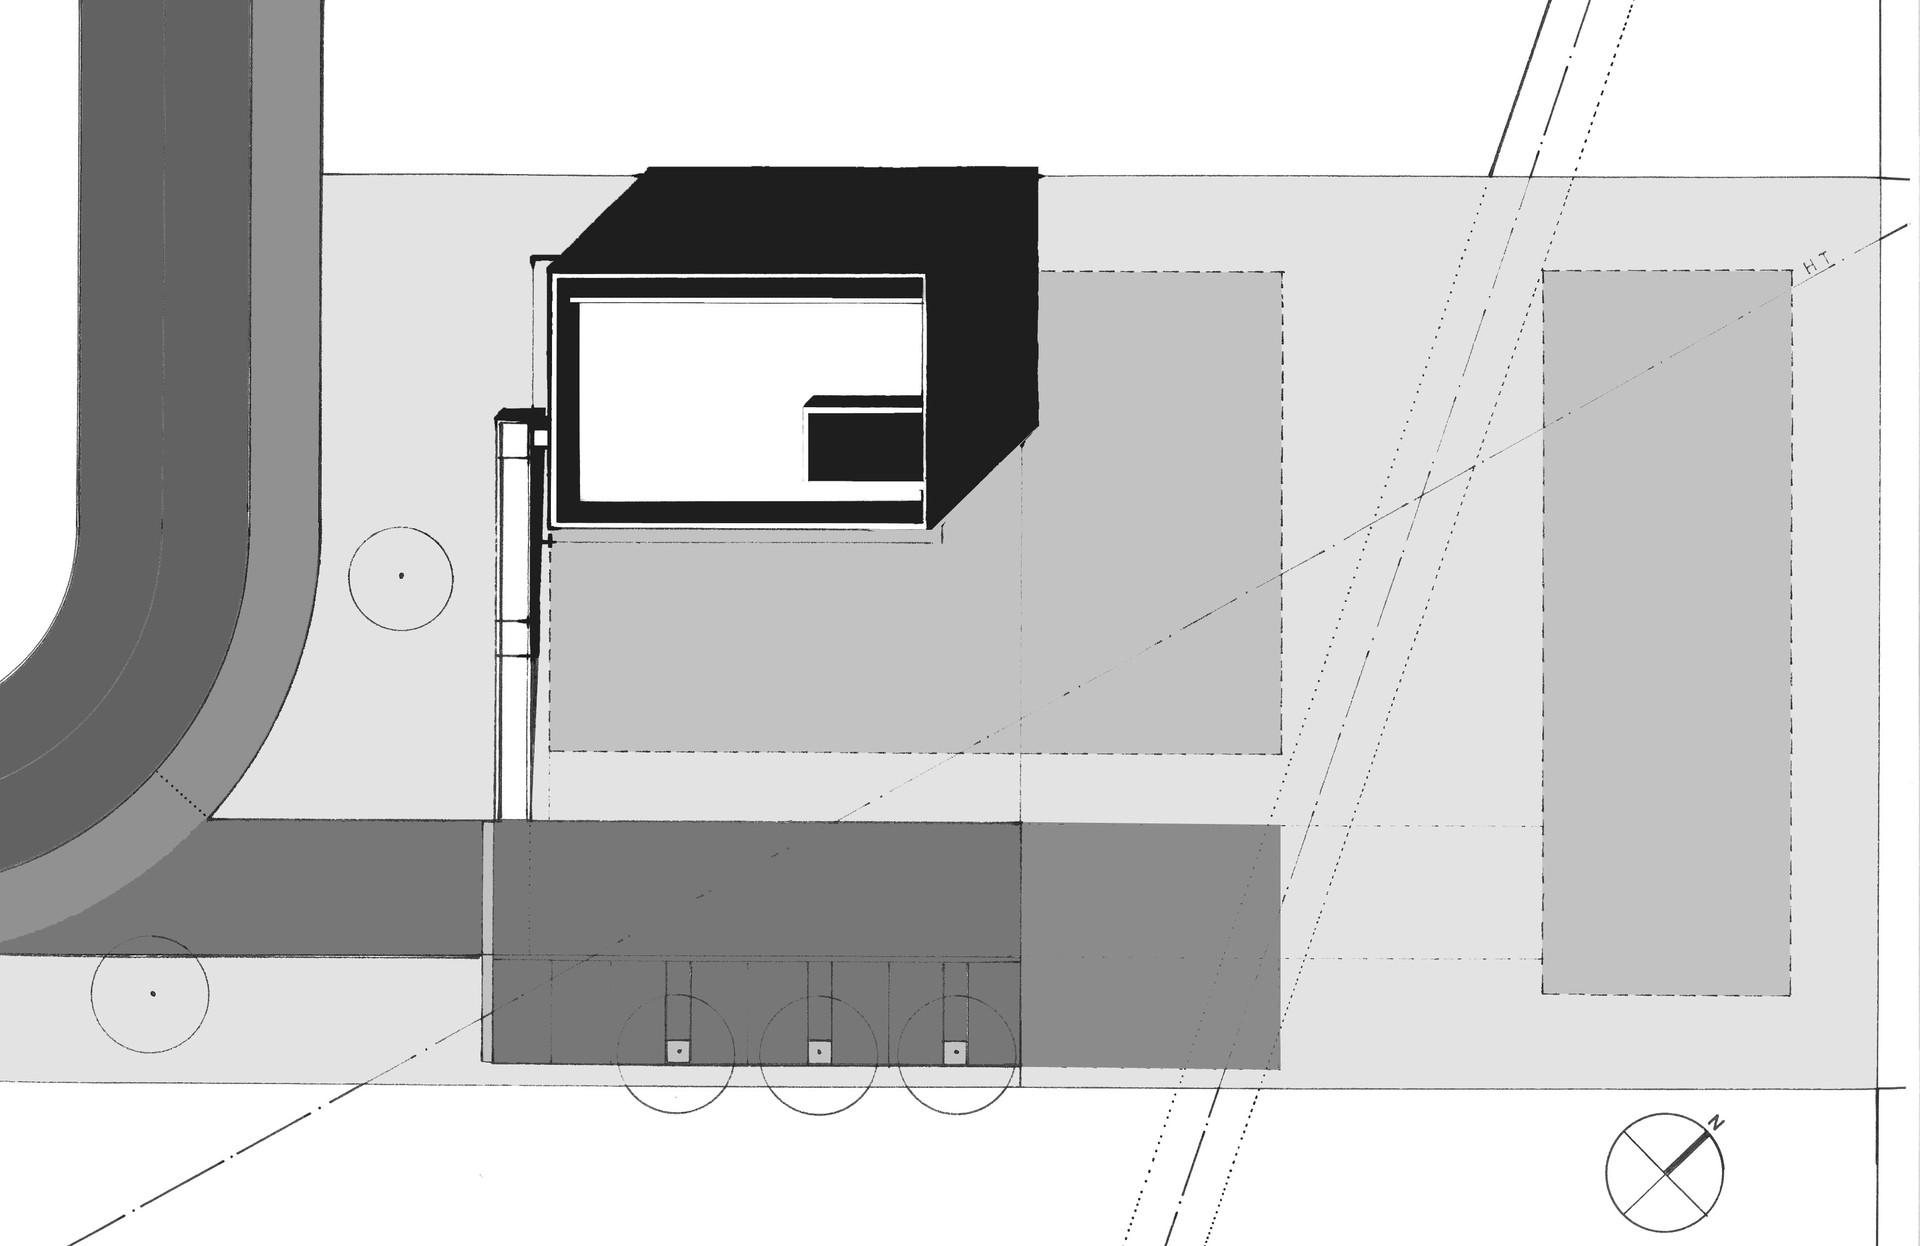 plan masse phases.jpg